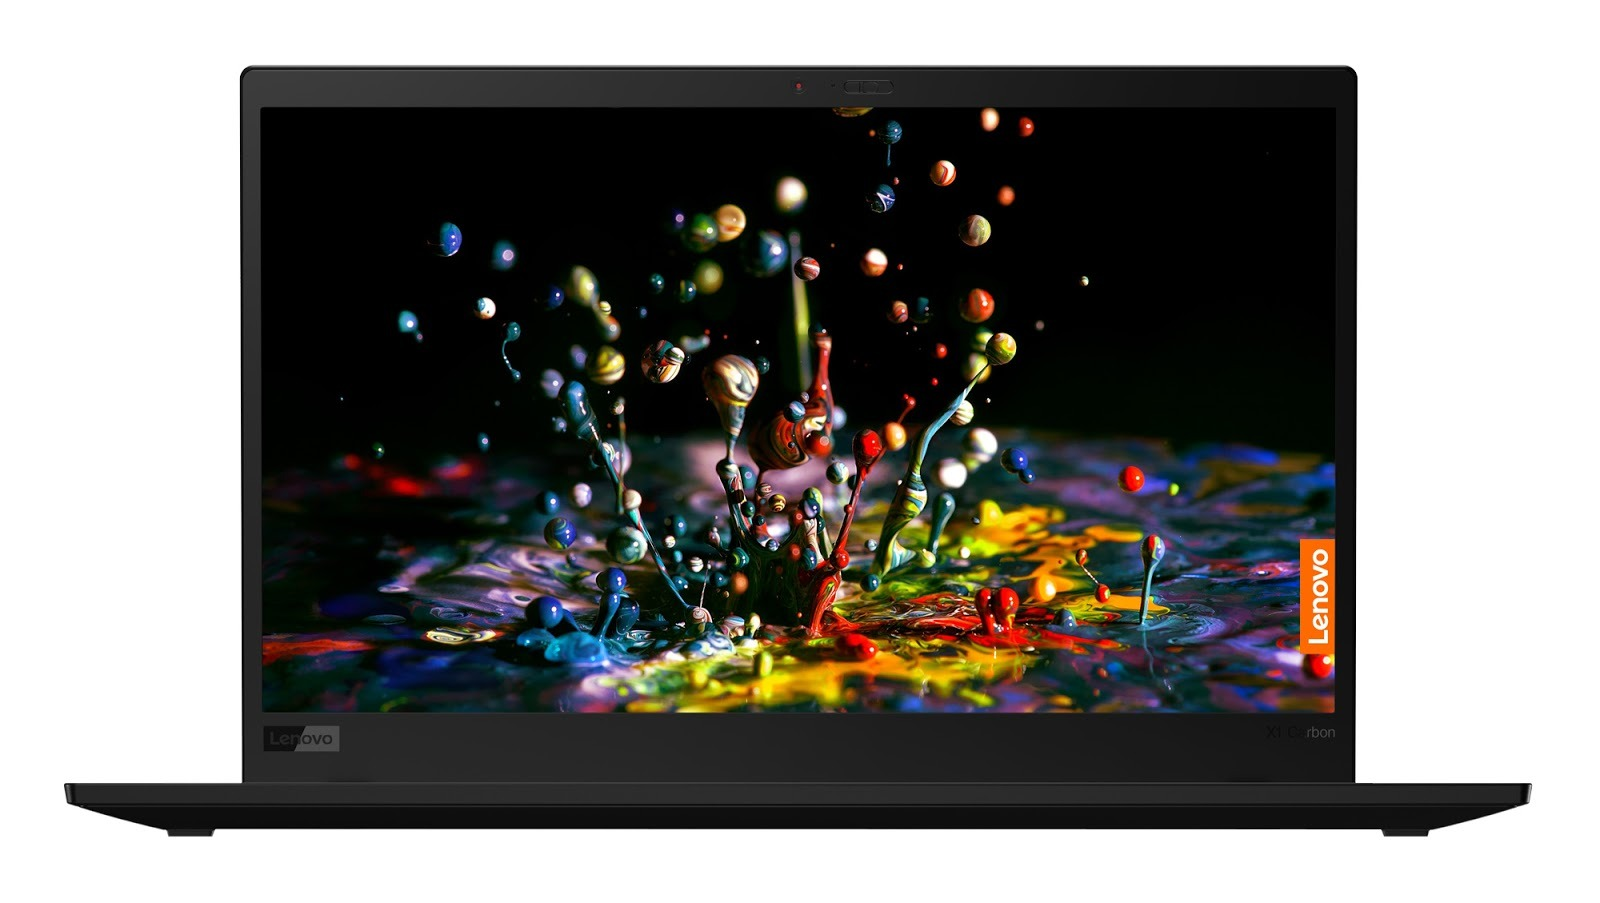 Фото 1. Lenovo ThinkPad X1 Carbon 7th Gen Black (20QD003DRT)